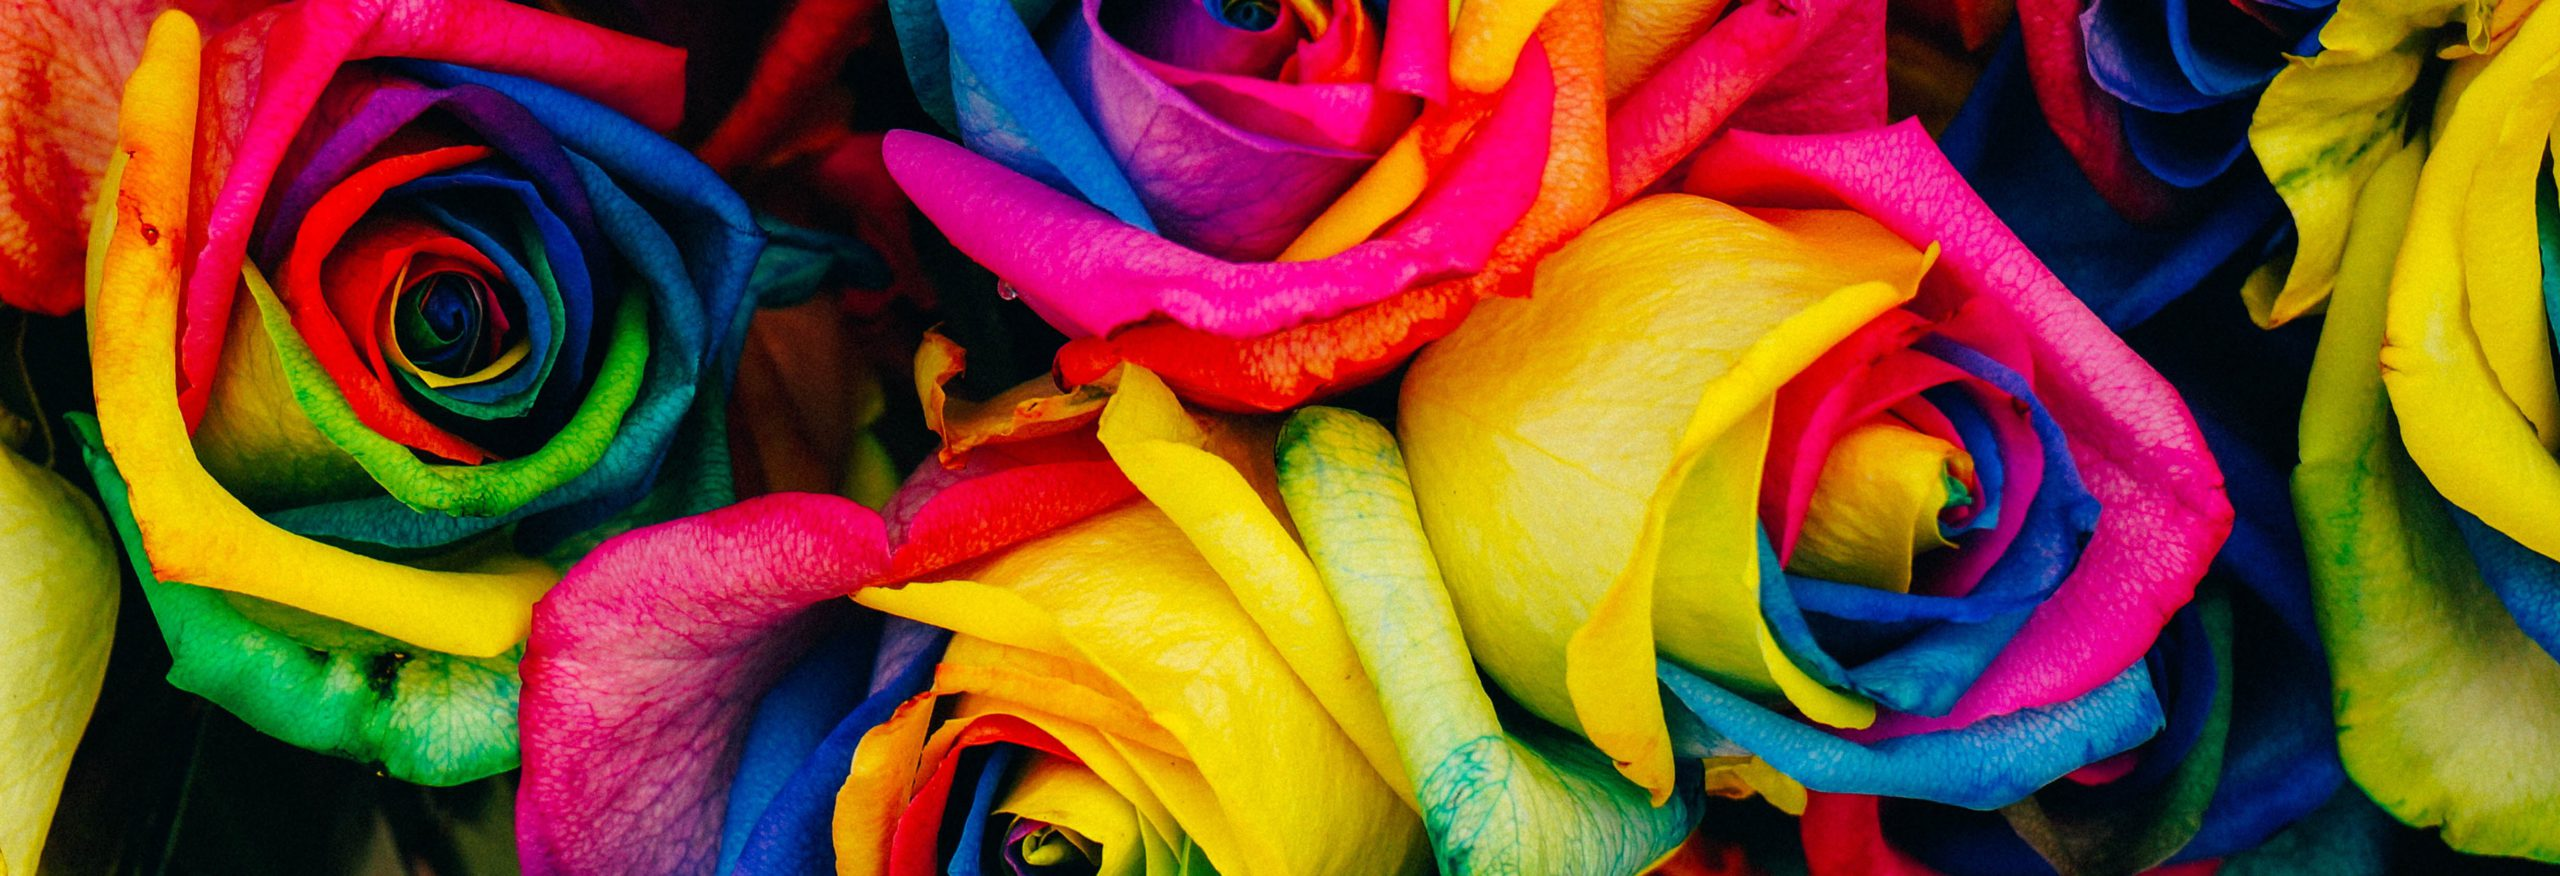 Rose Essential Oils For Men - coloured roses